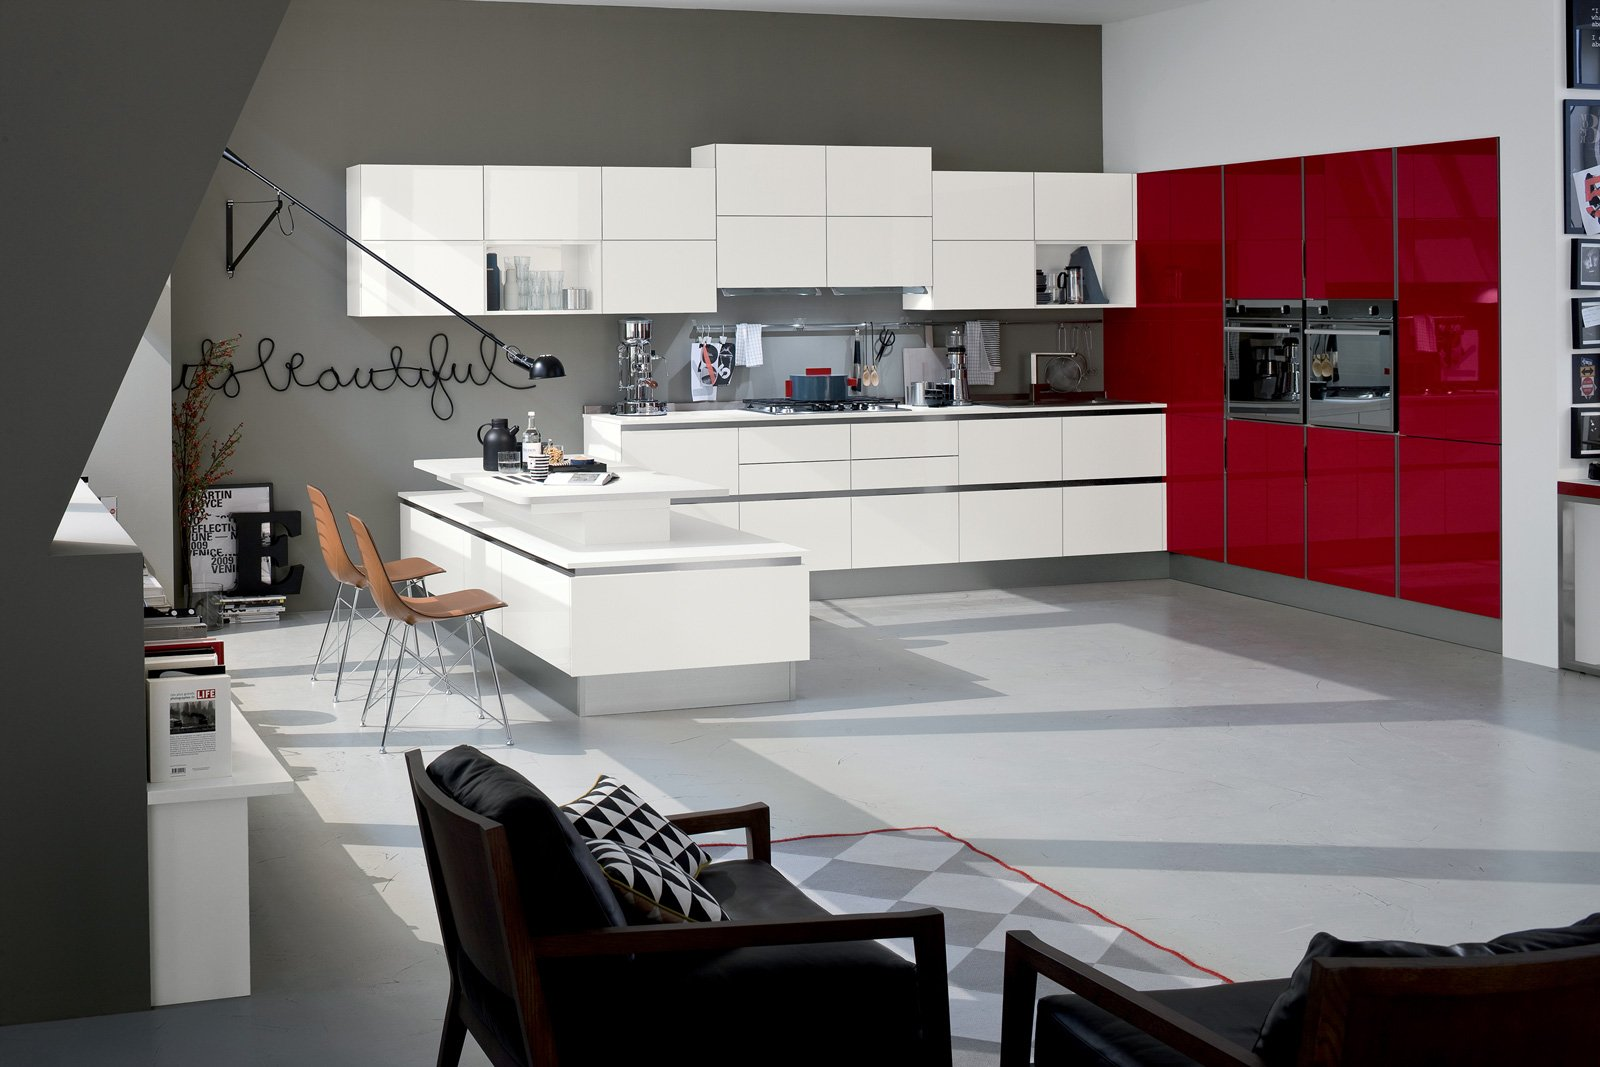 Cucine bicolore l 39 alternanza cromatica fa tendenza cose - Foto di cucine ...